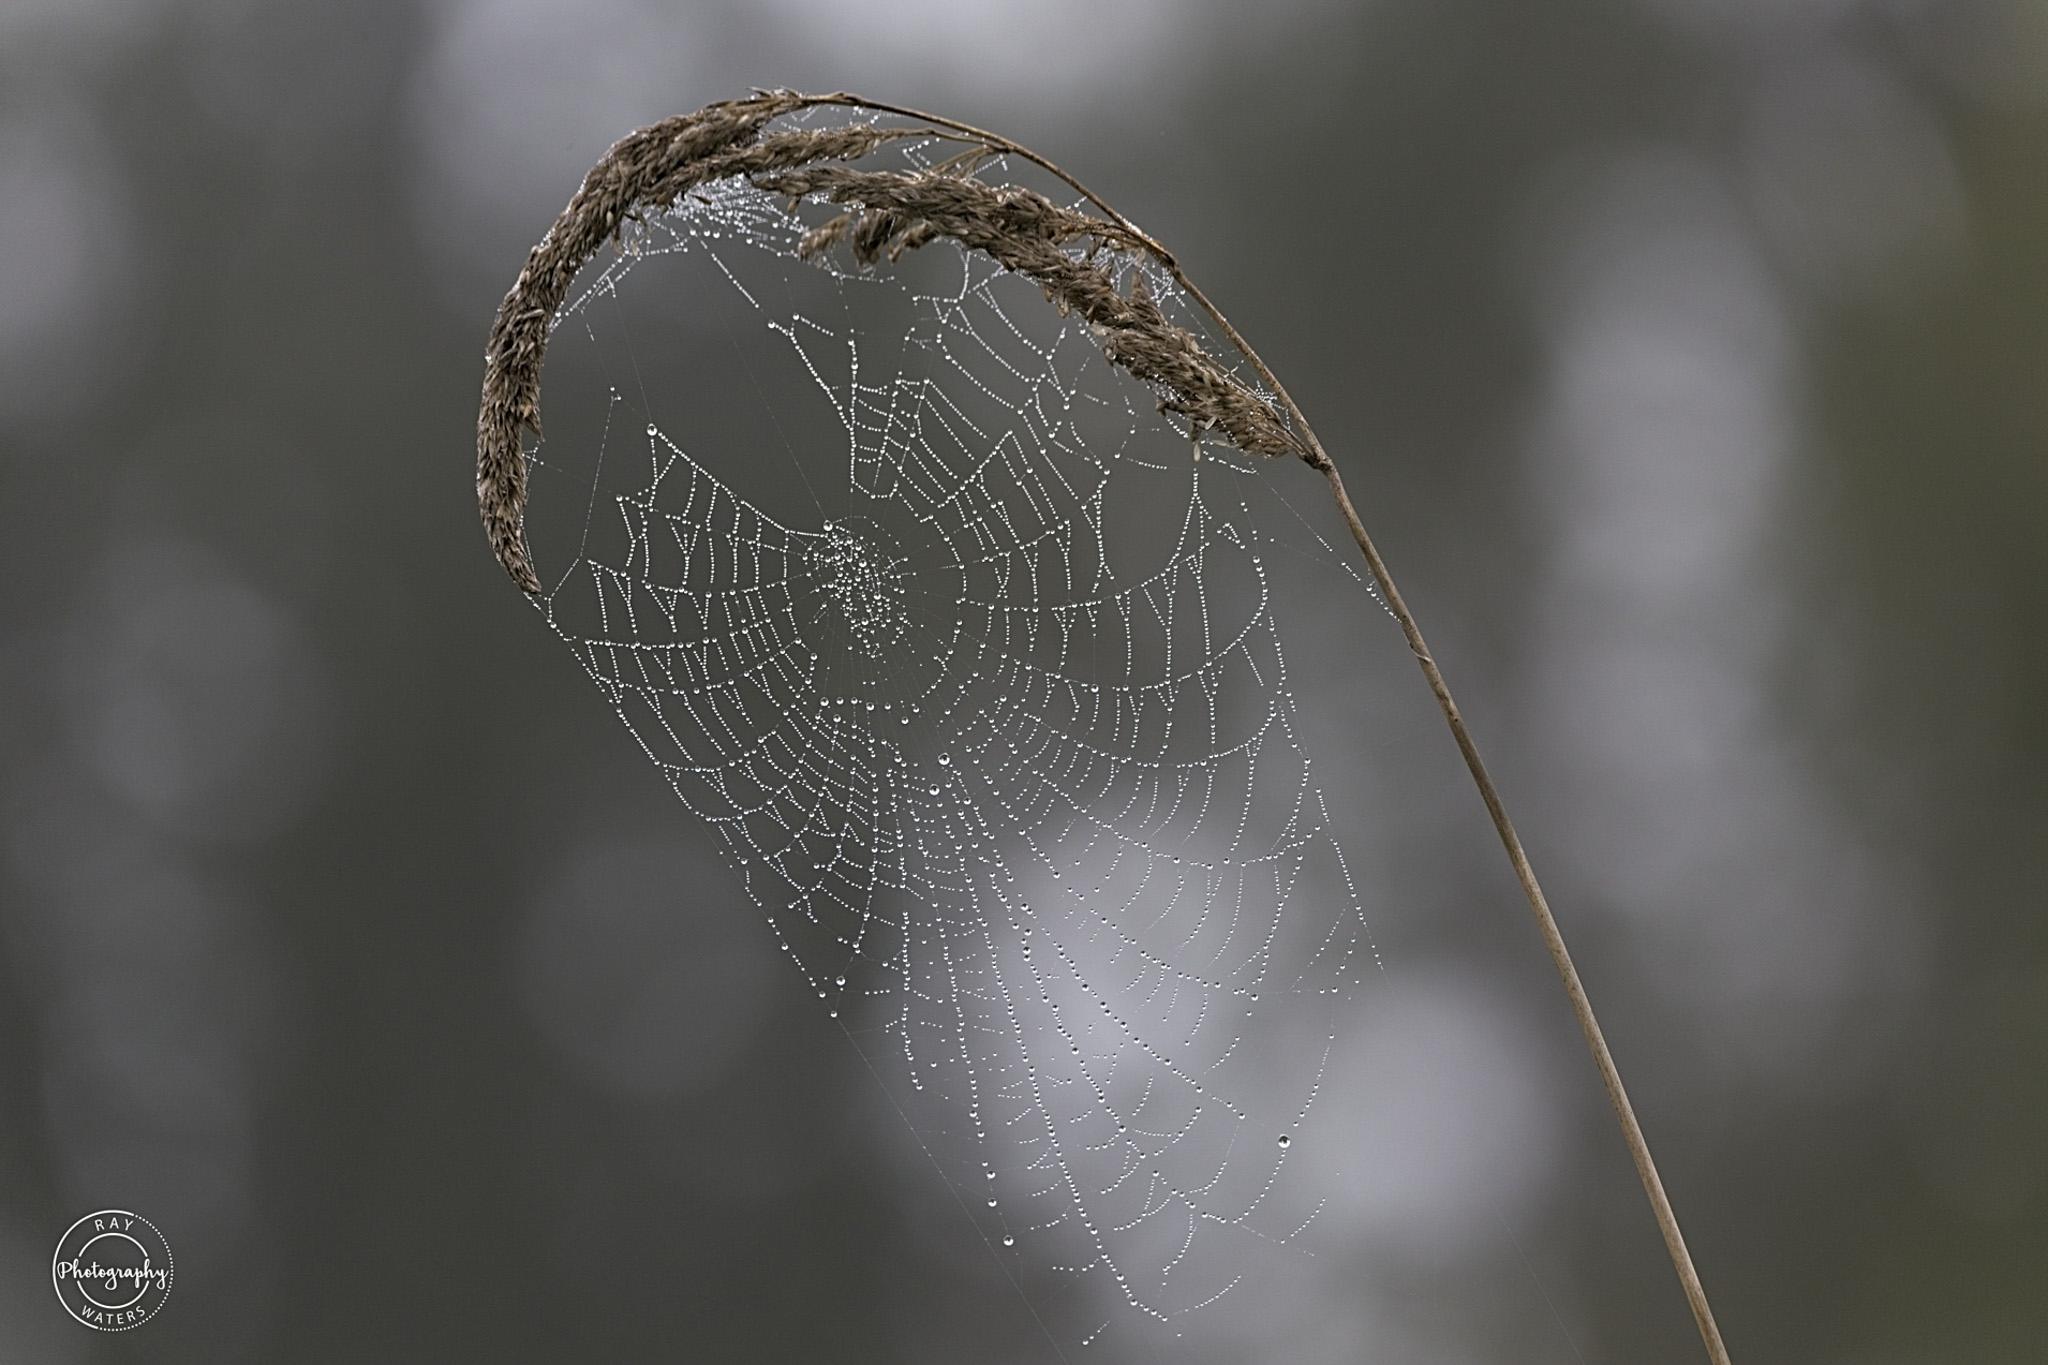 Soaking Web Ray Waters